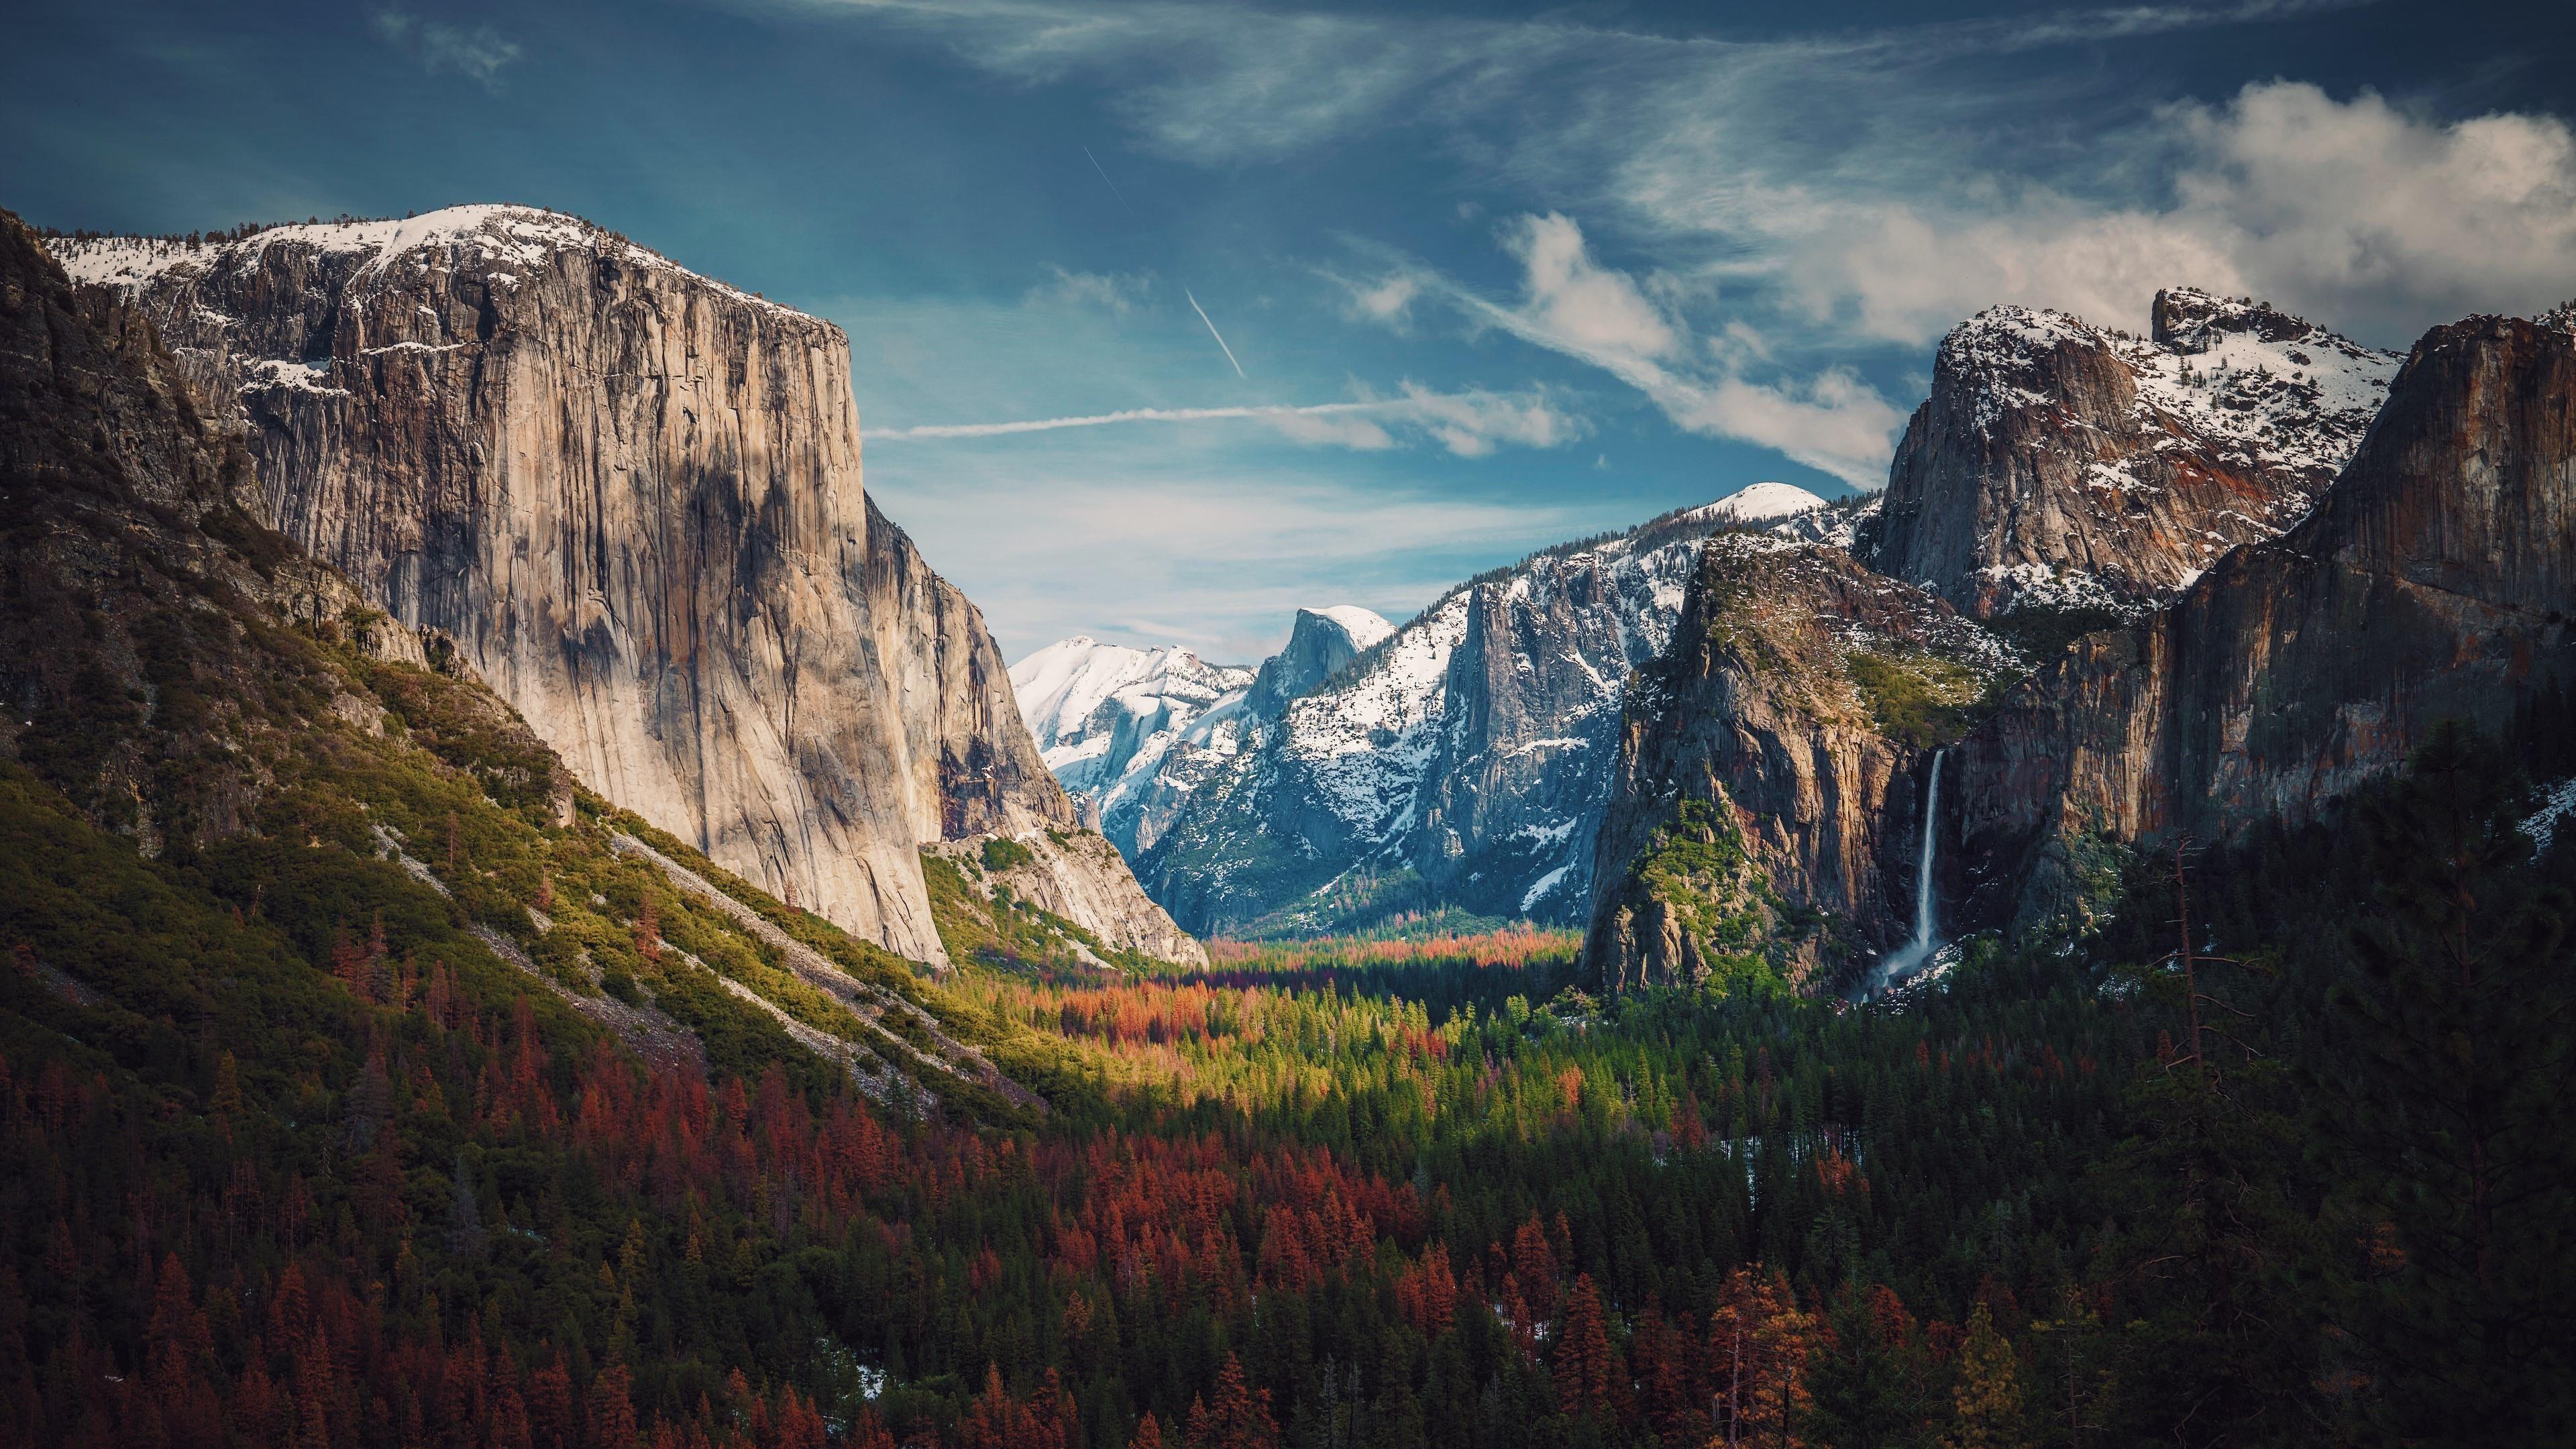 Yosemite Valley Wallpapers Is 4k Wallpaper Yodobi Yosemite Yosemite Park West Coast Road Trip